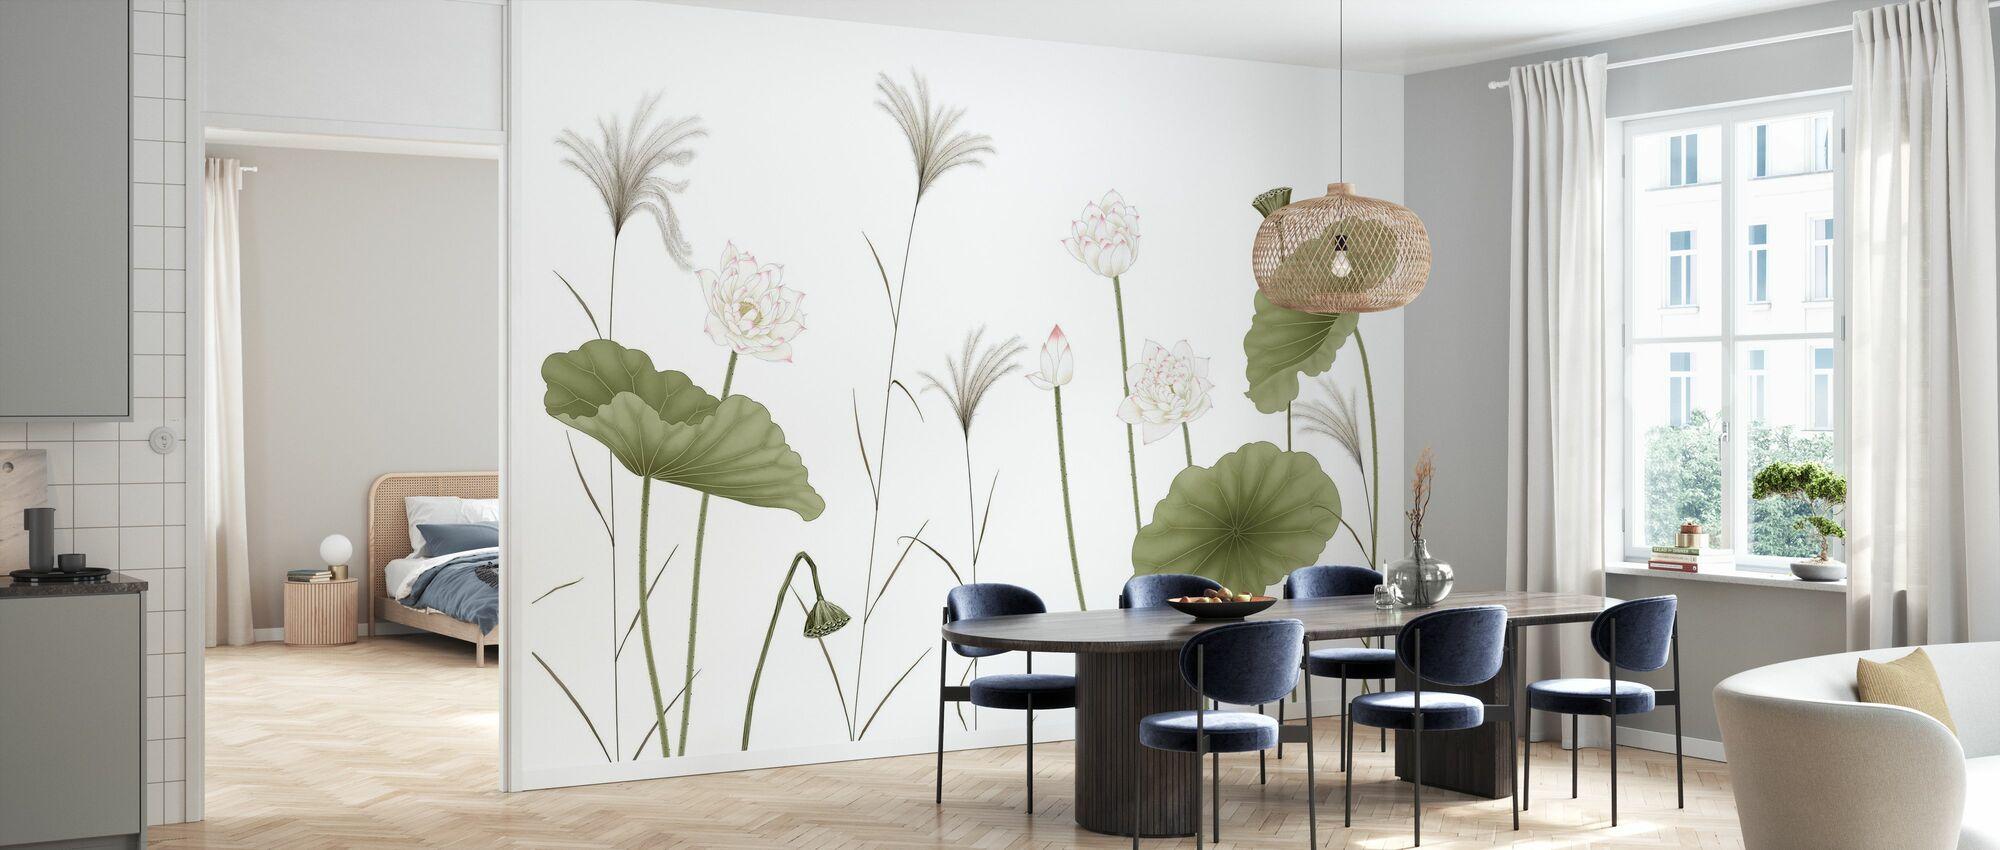 Let It Grow - Wallpaper - Kitchen